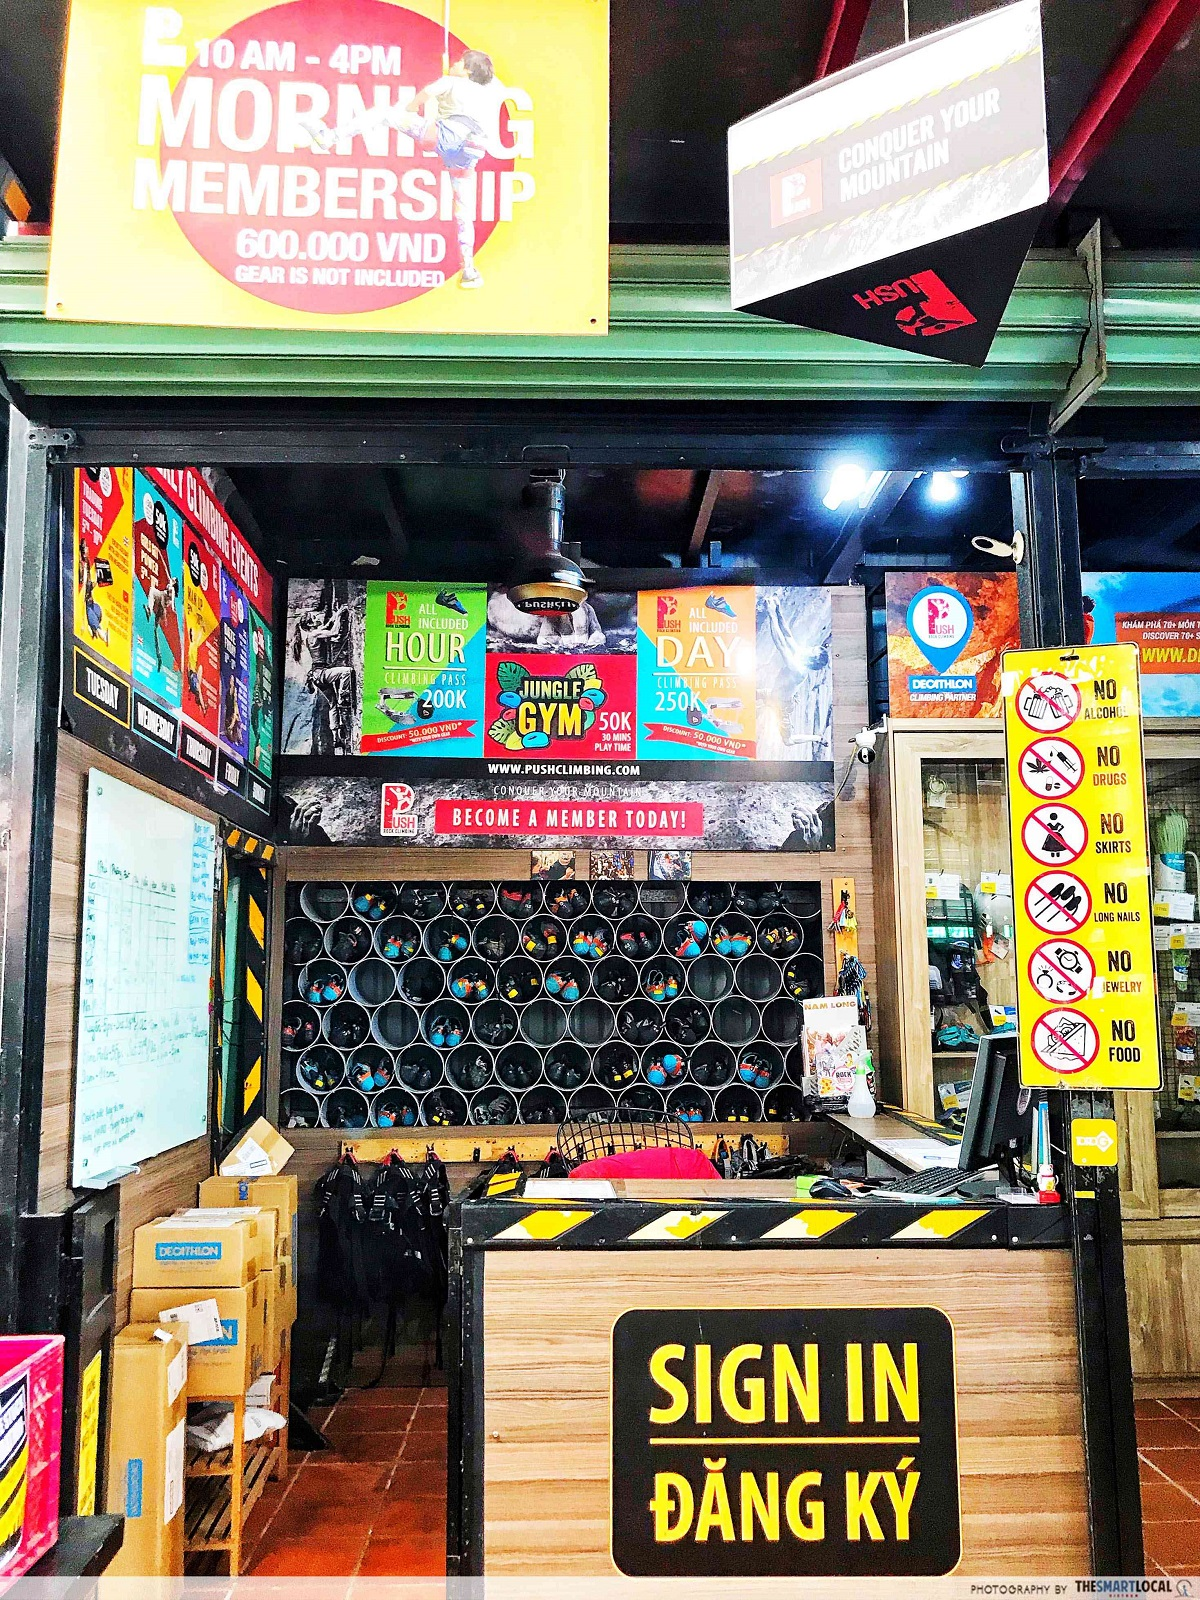 saigon outcast - rock climbing rental shop